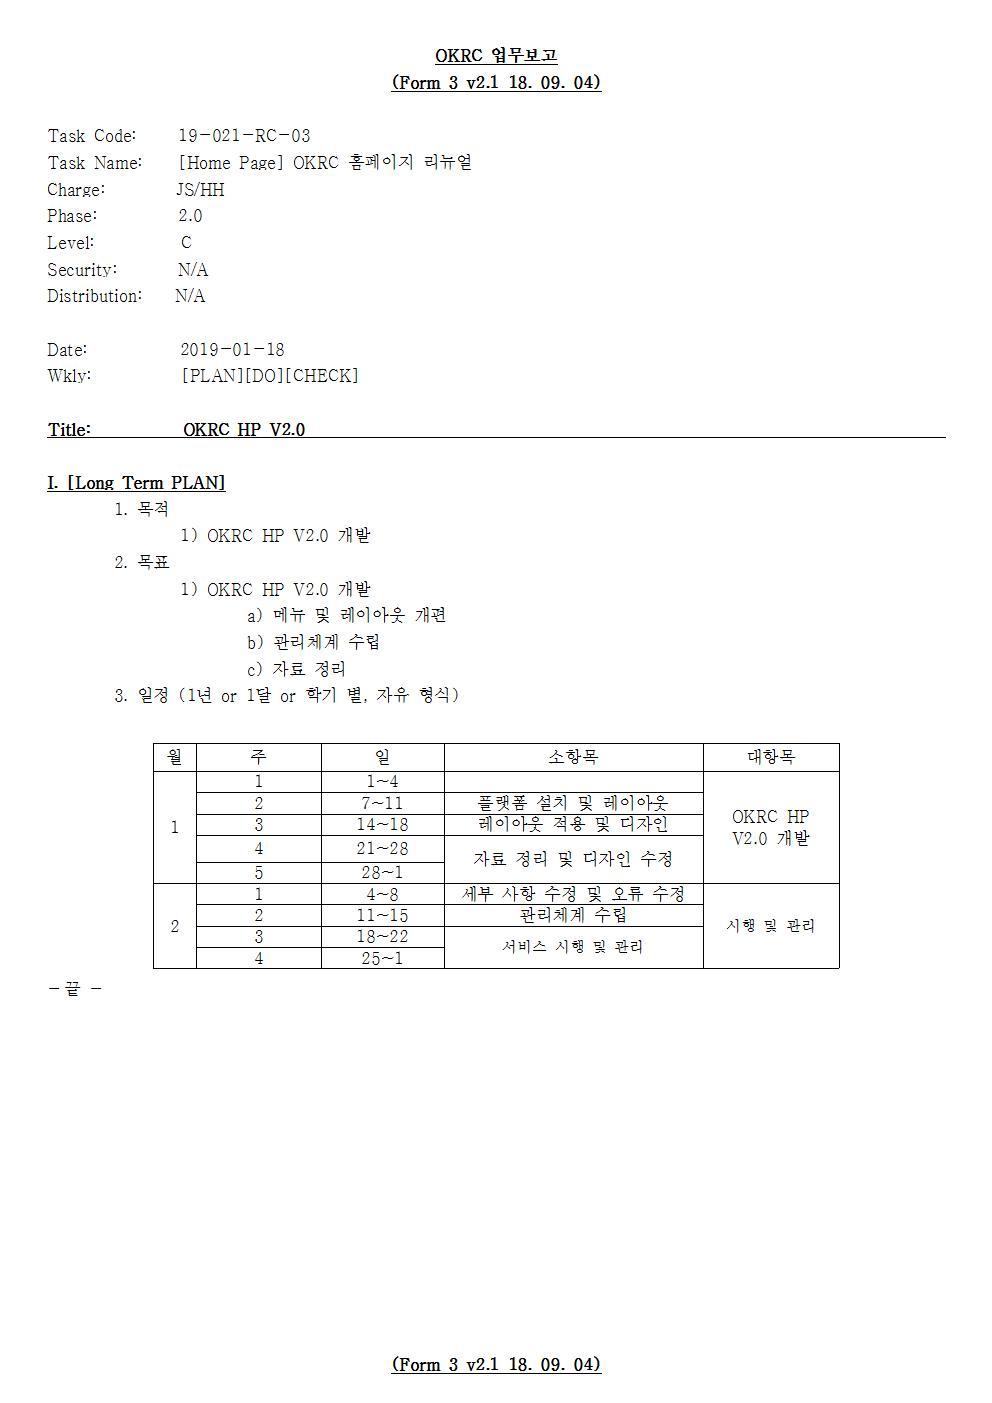 D-[19-021-RC-03]-[OKRCHP V2.0]-[2019-01-18][HH]001.jpg